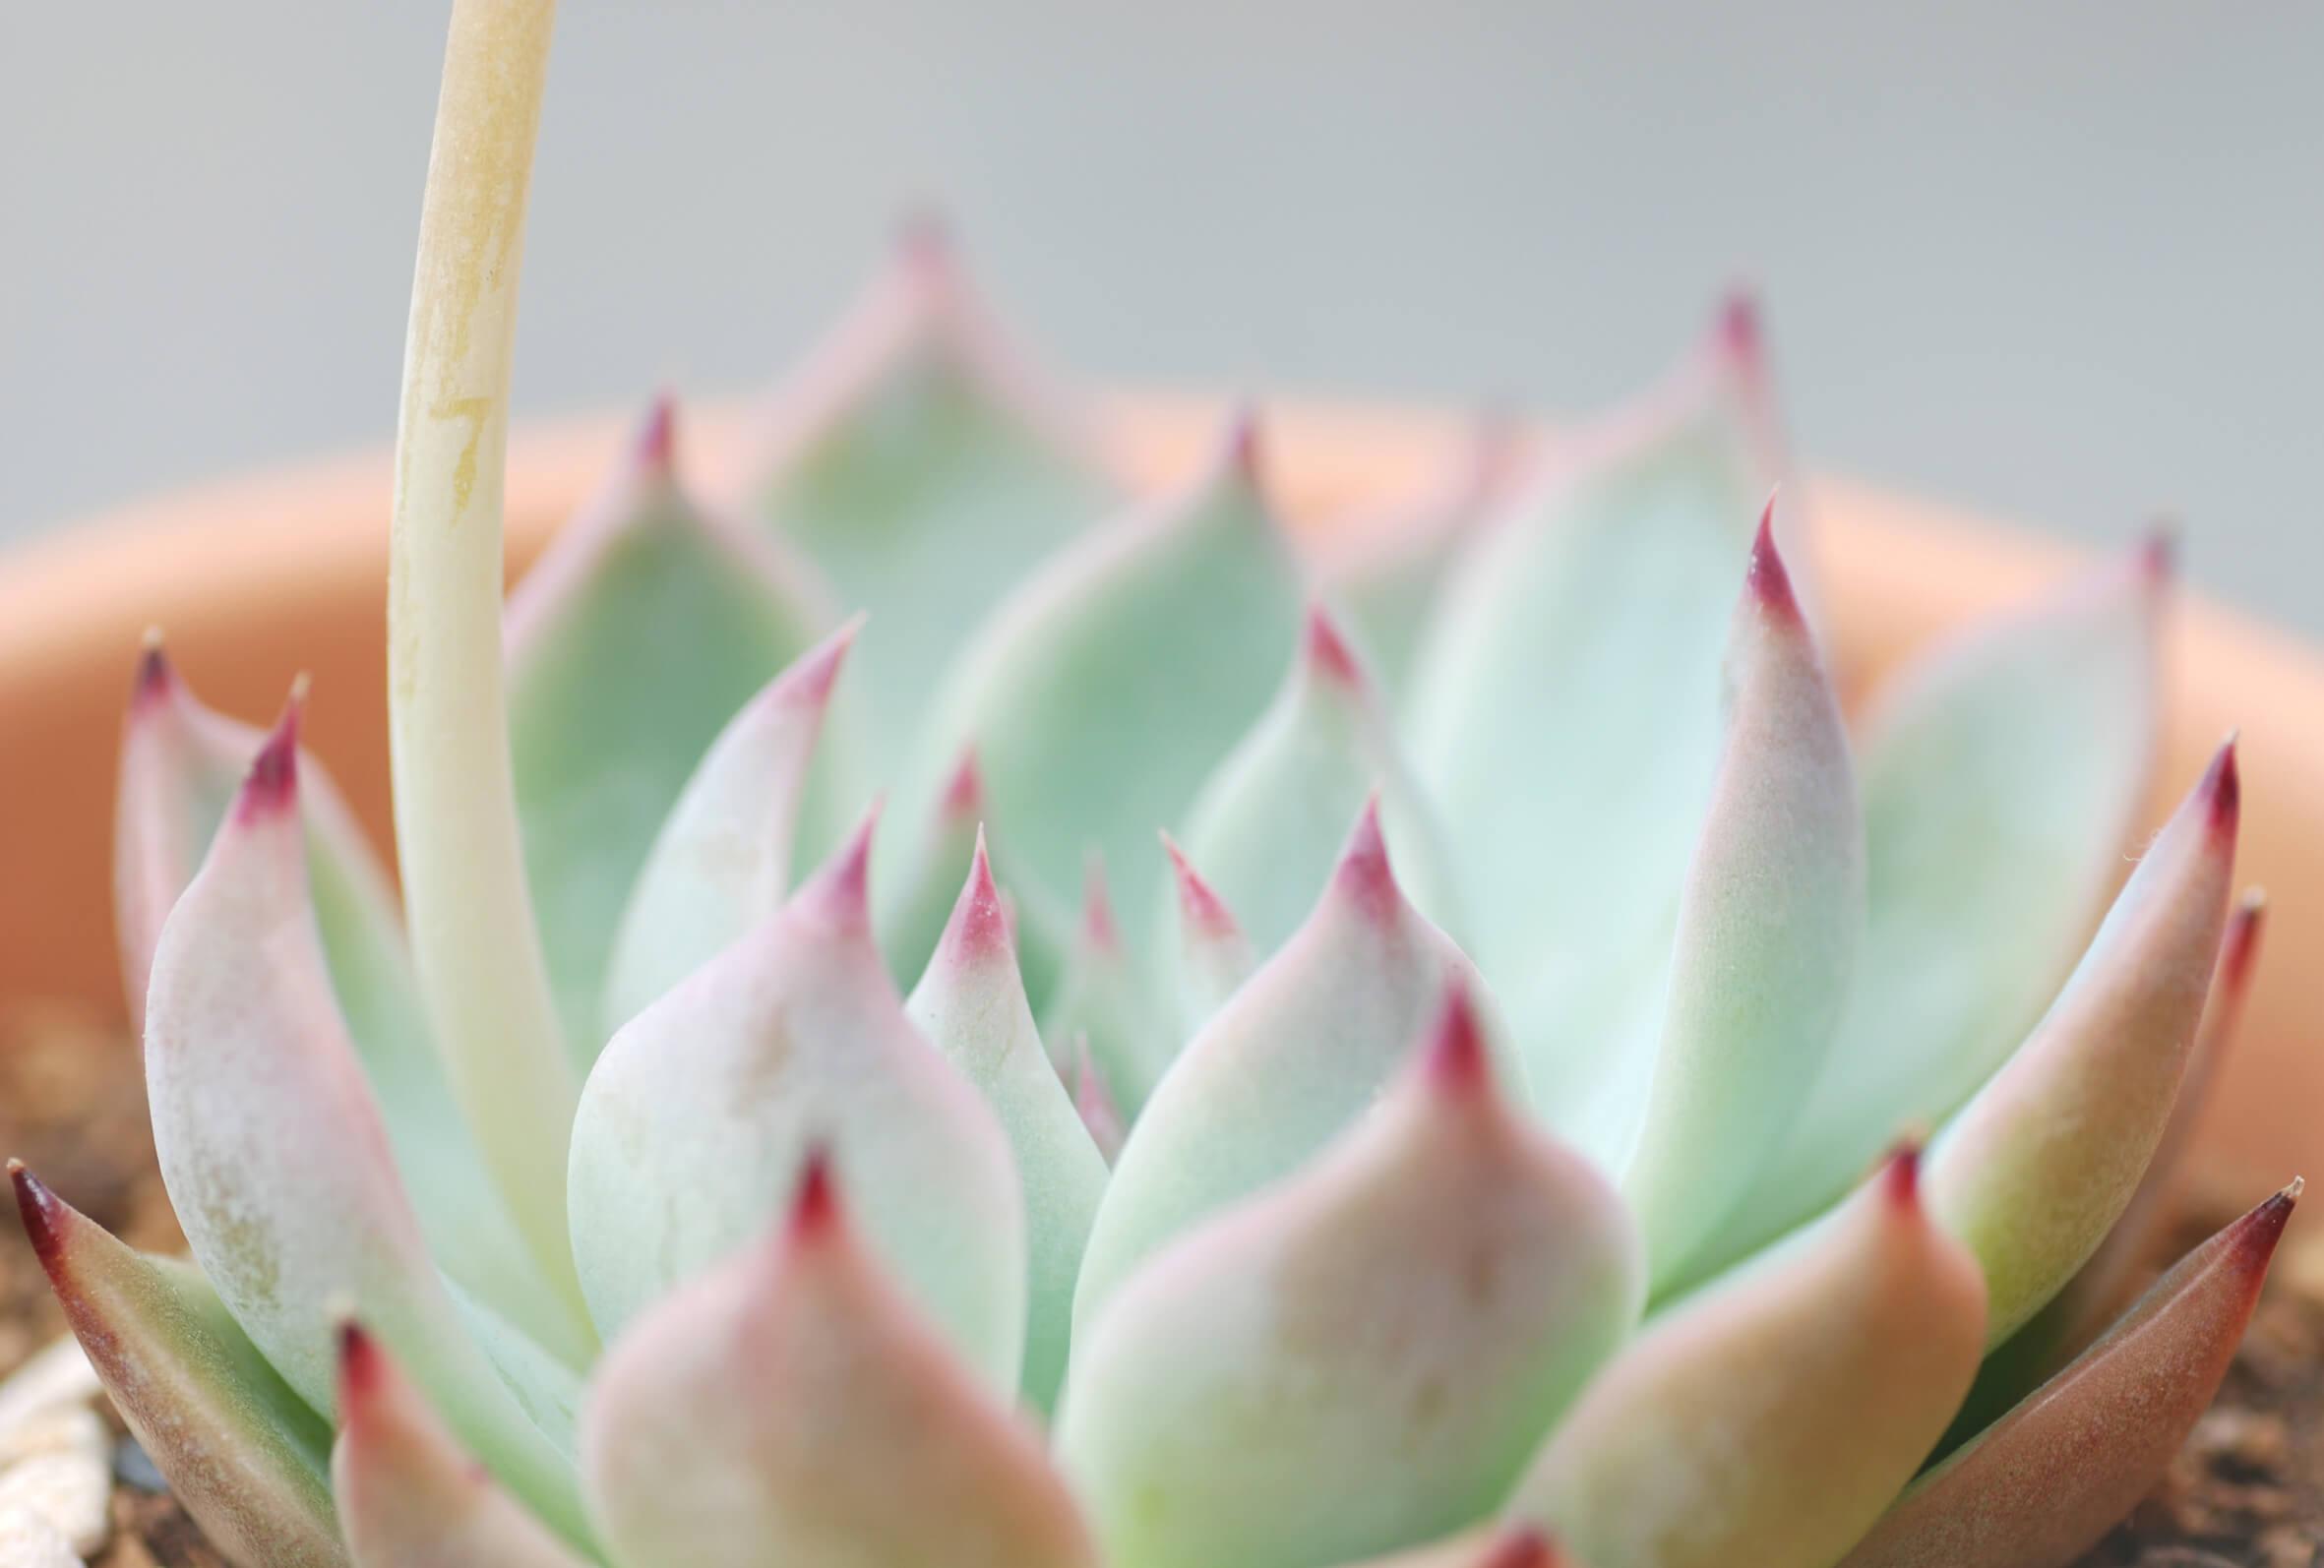 echeveria-chihuahuaensis-03-apr-2020.jpg